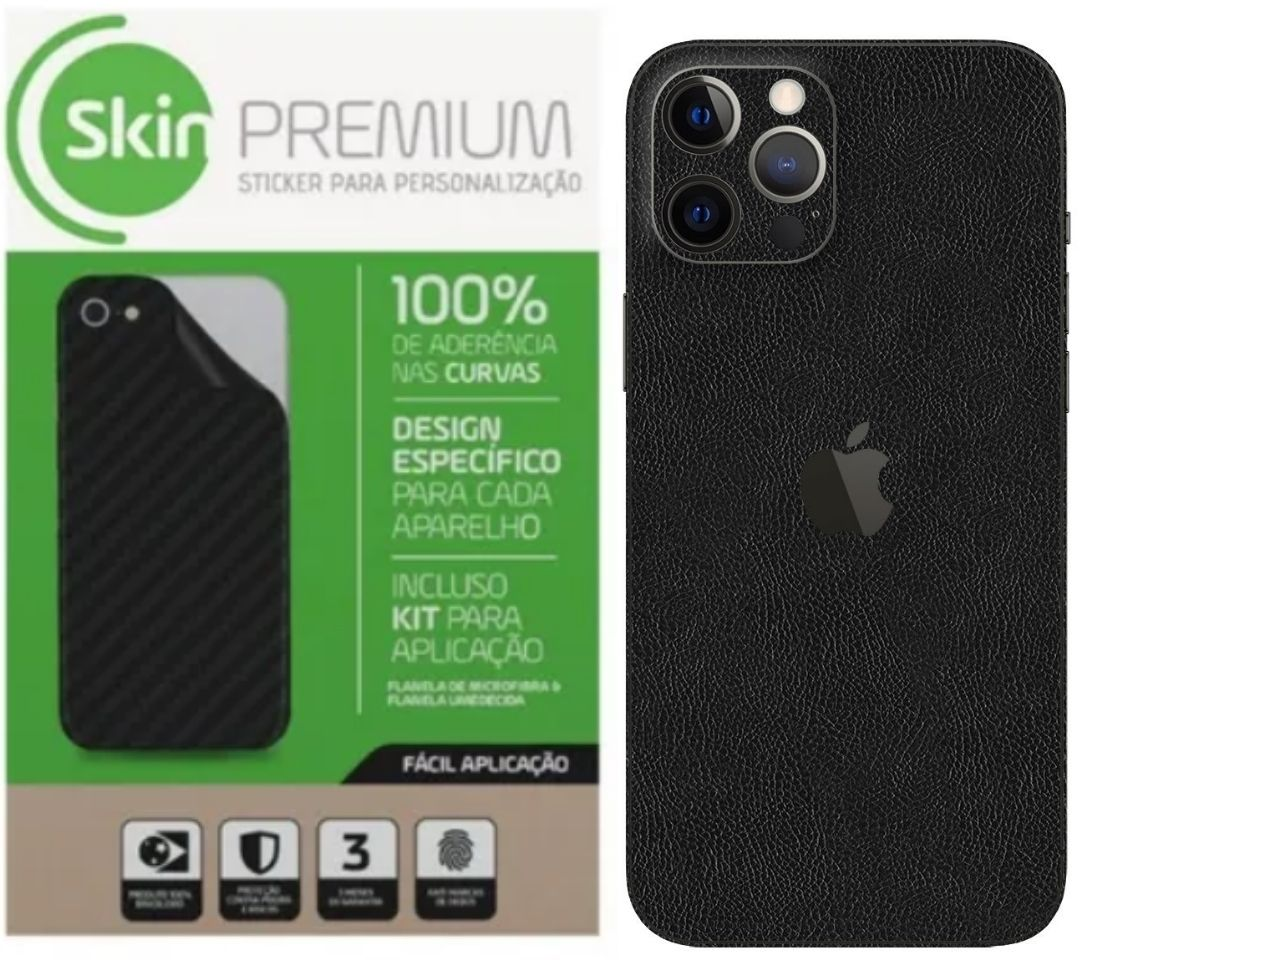 Skin Premium Verso e Laterais Estampa de Couro para Iphone 12 Pro Max